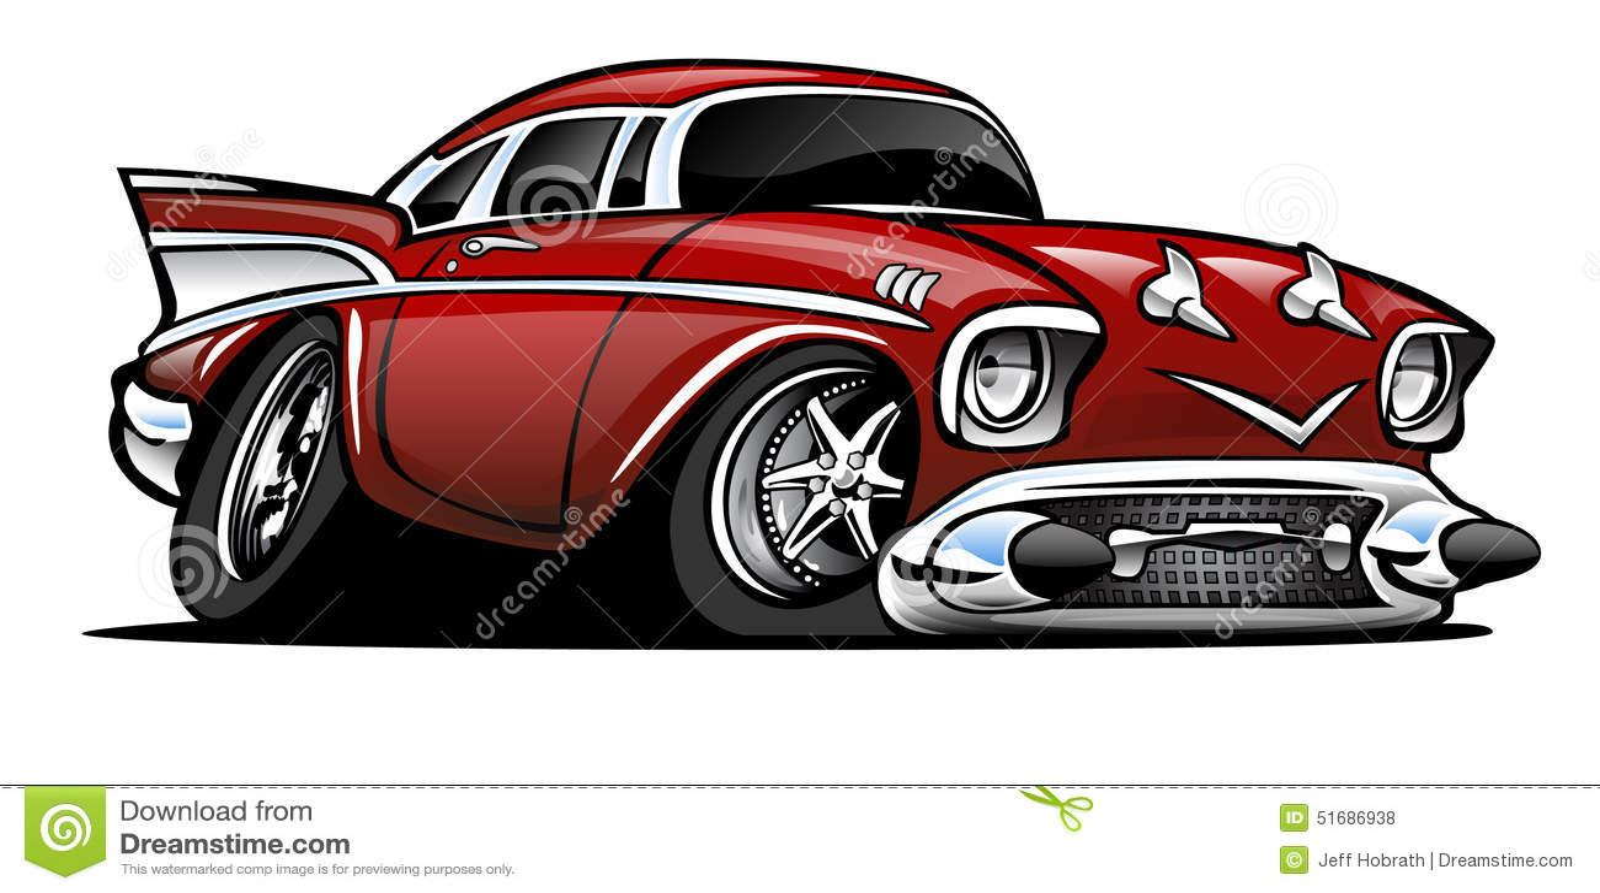 57 Chevy Vector Illustration